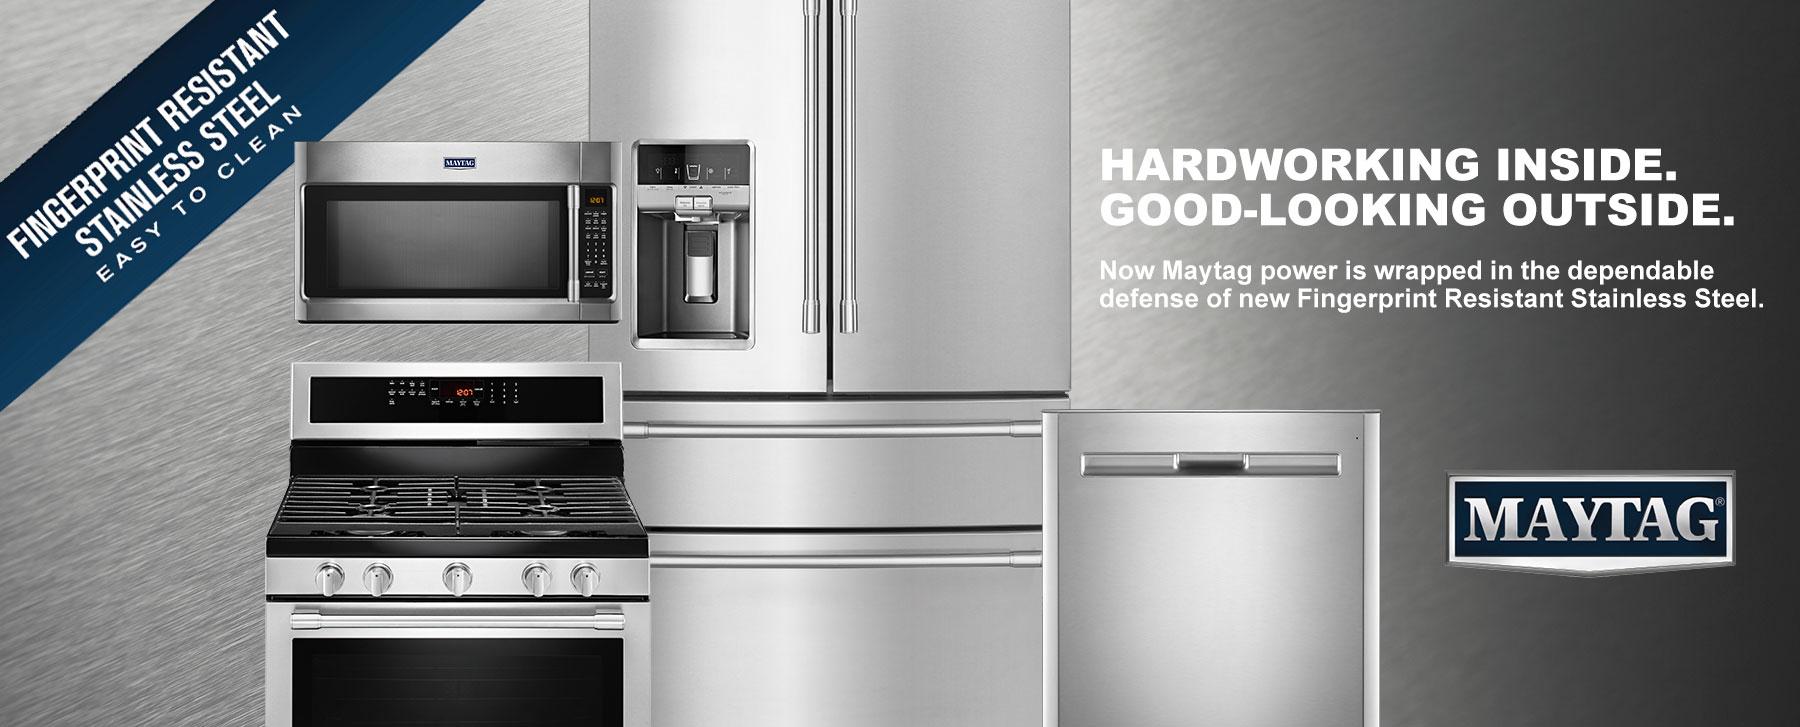 maytag appliances - shop now - responsive home appliances